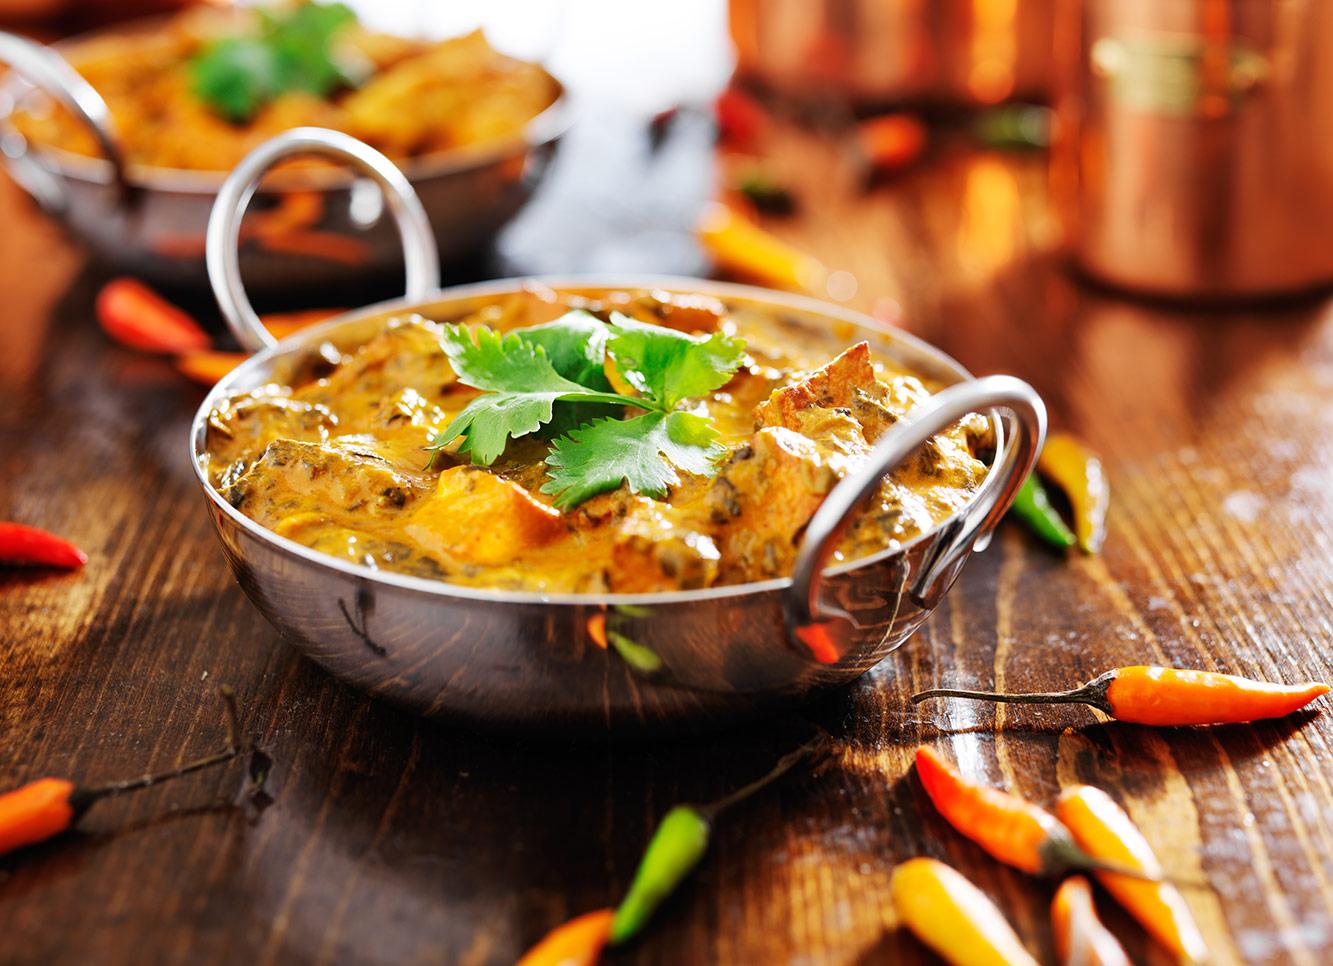 Takeaway Vegetable Monsoon Indian Cuisine SS4